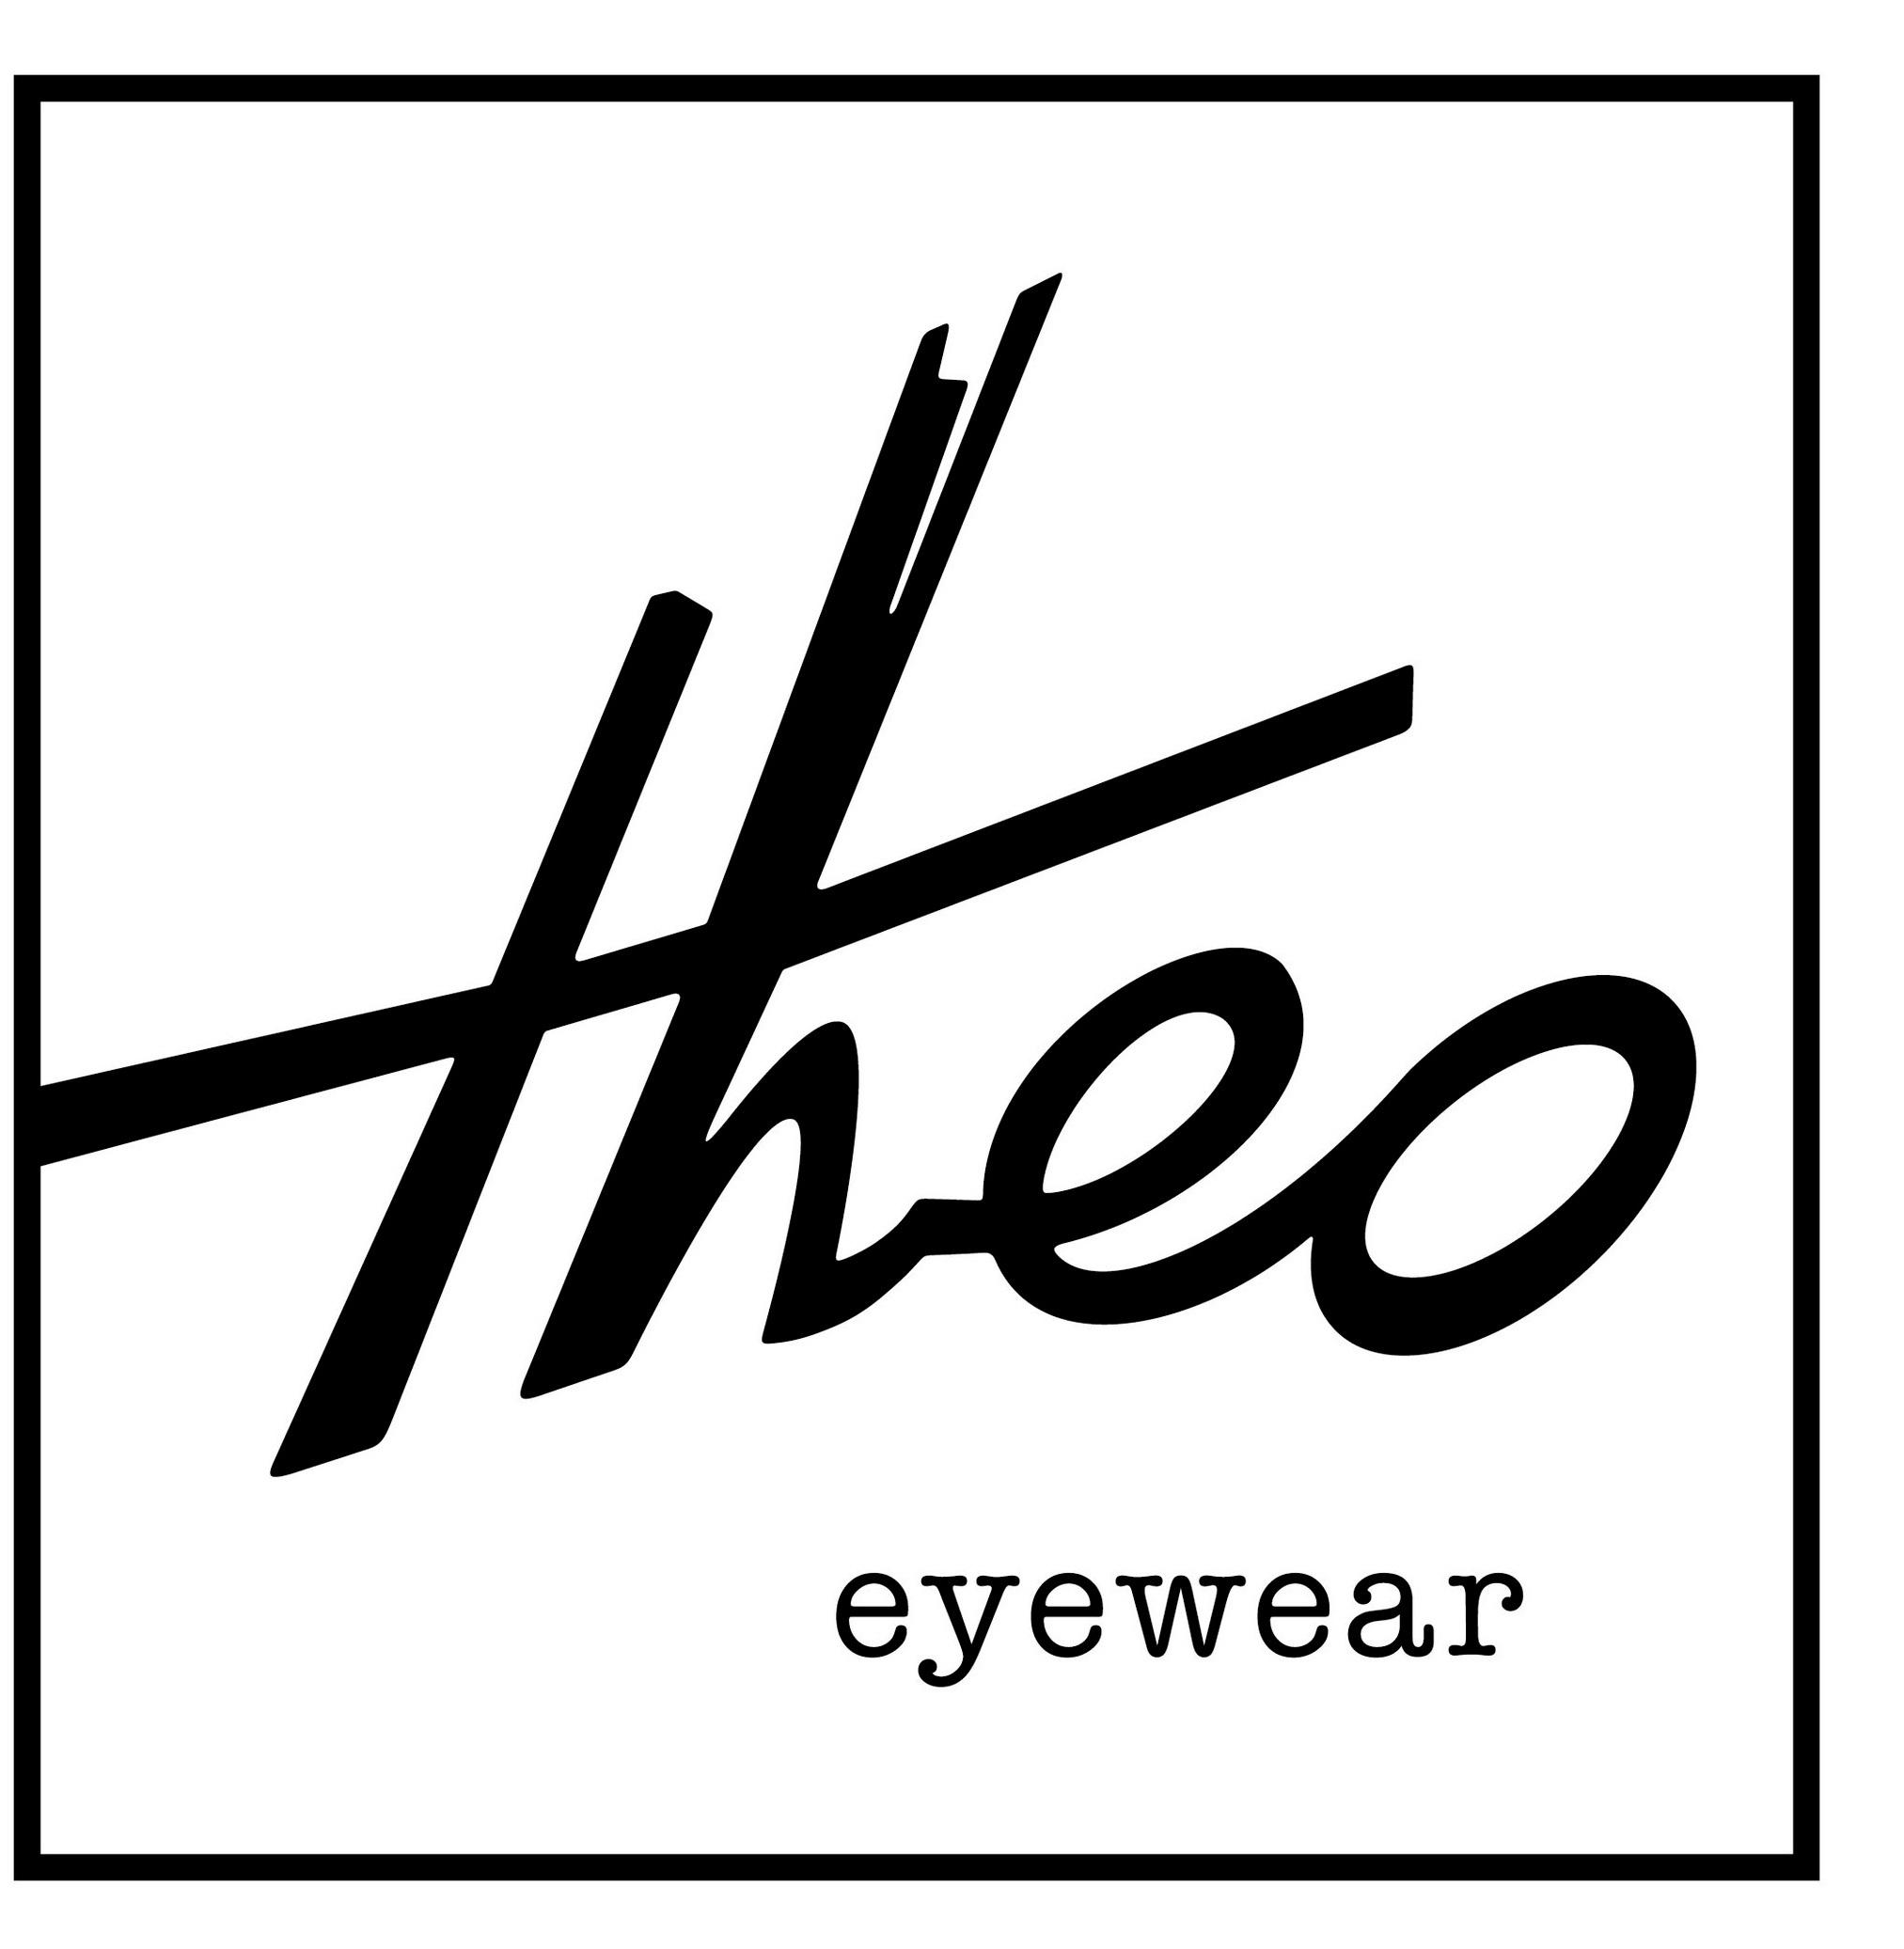 theo-logo-2015.jpg